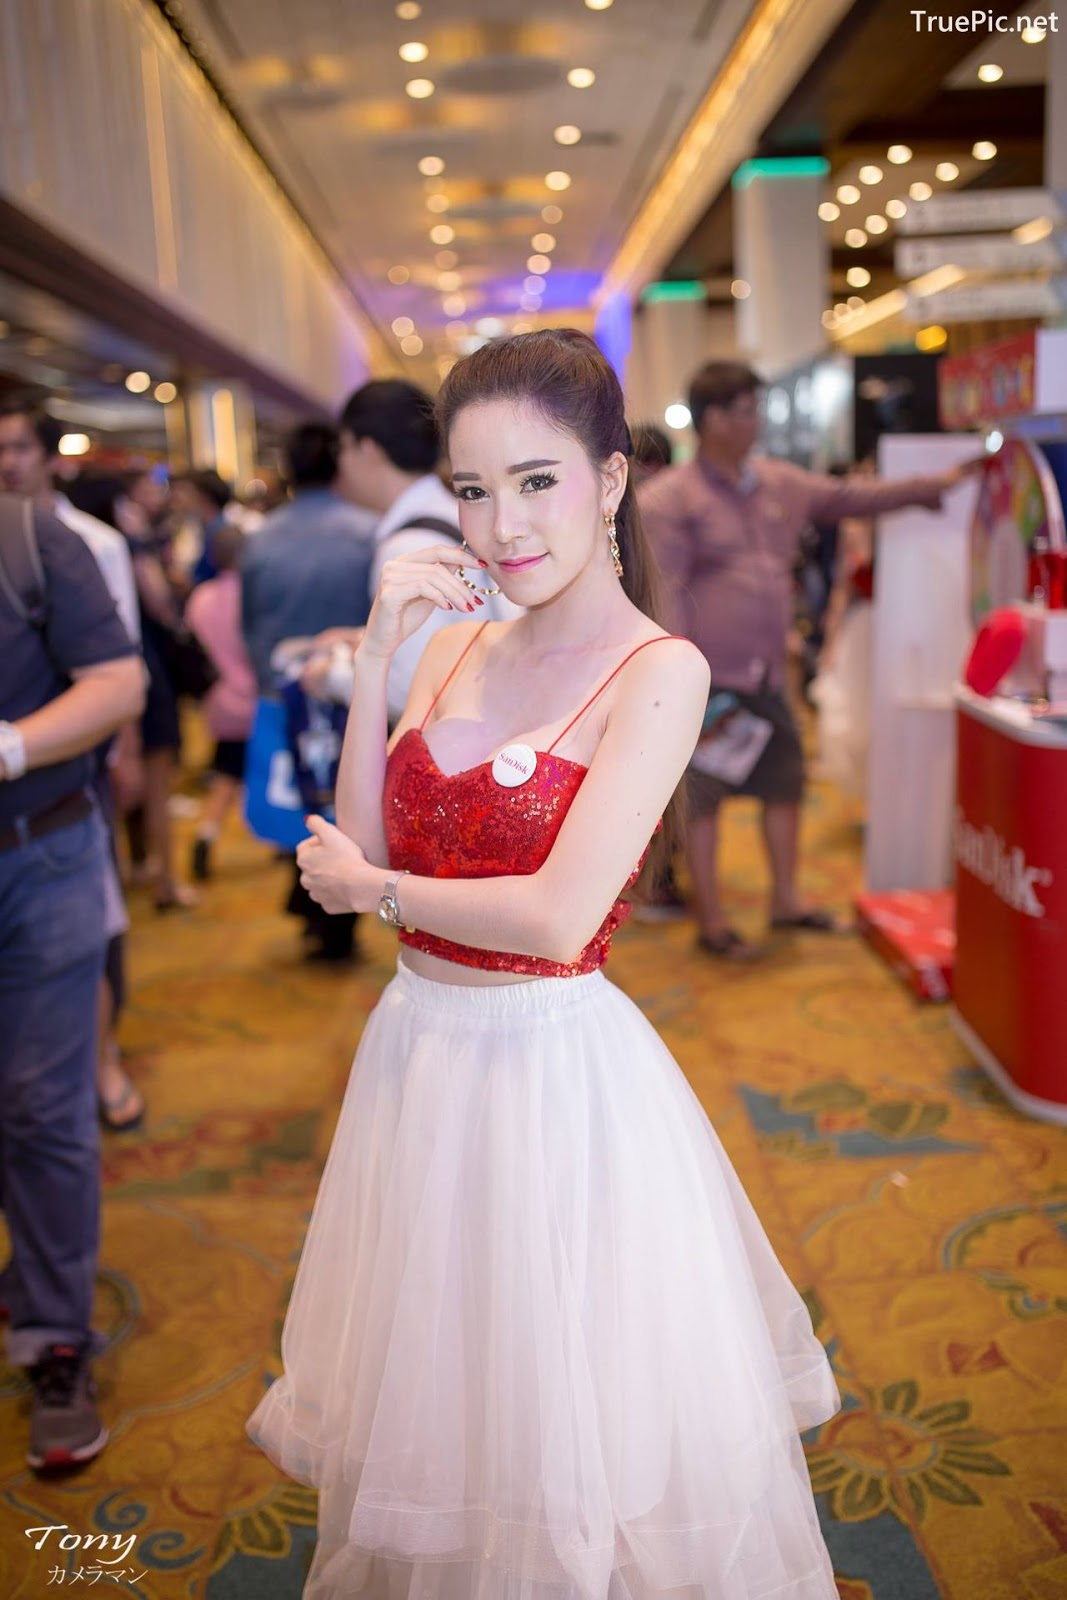 Image-Thailand-Hot-Model-Thai-PG-At-Commart-2018-TruePic.net- Picture-32